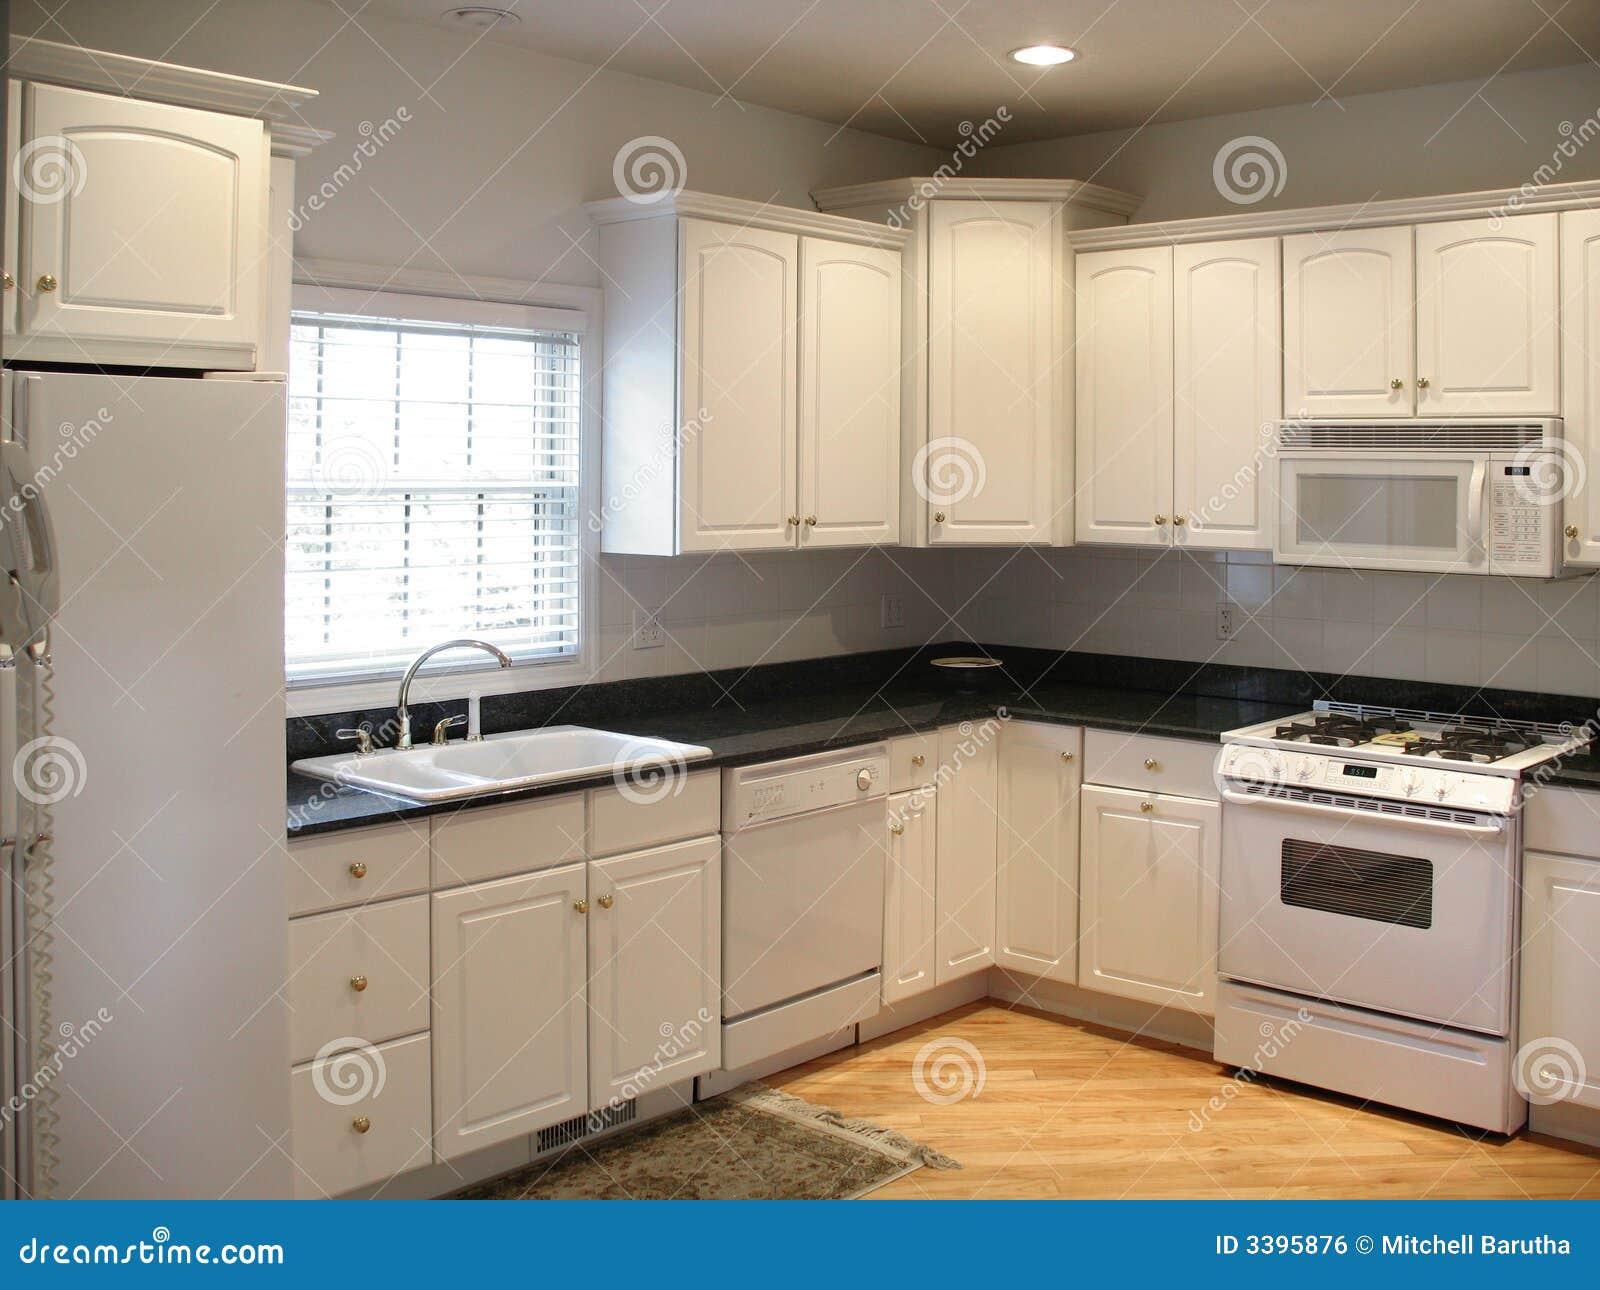 Upscale kitchen horizontal royalty free stock image - Upscale kitchen appliances ...